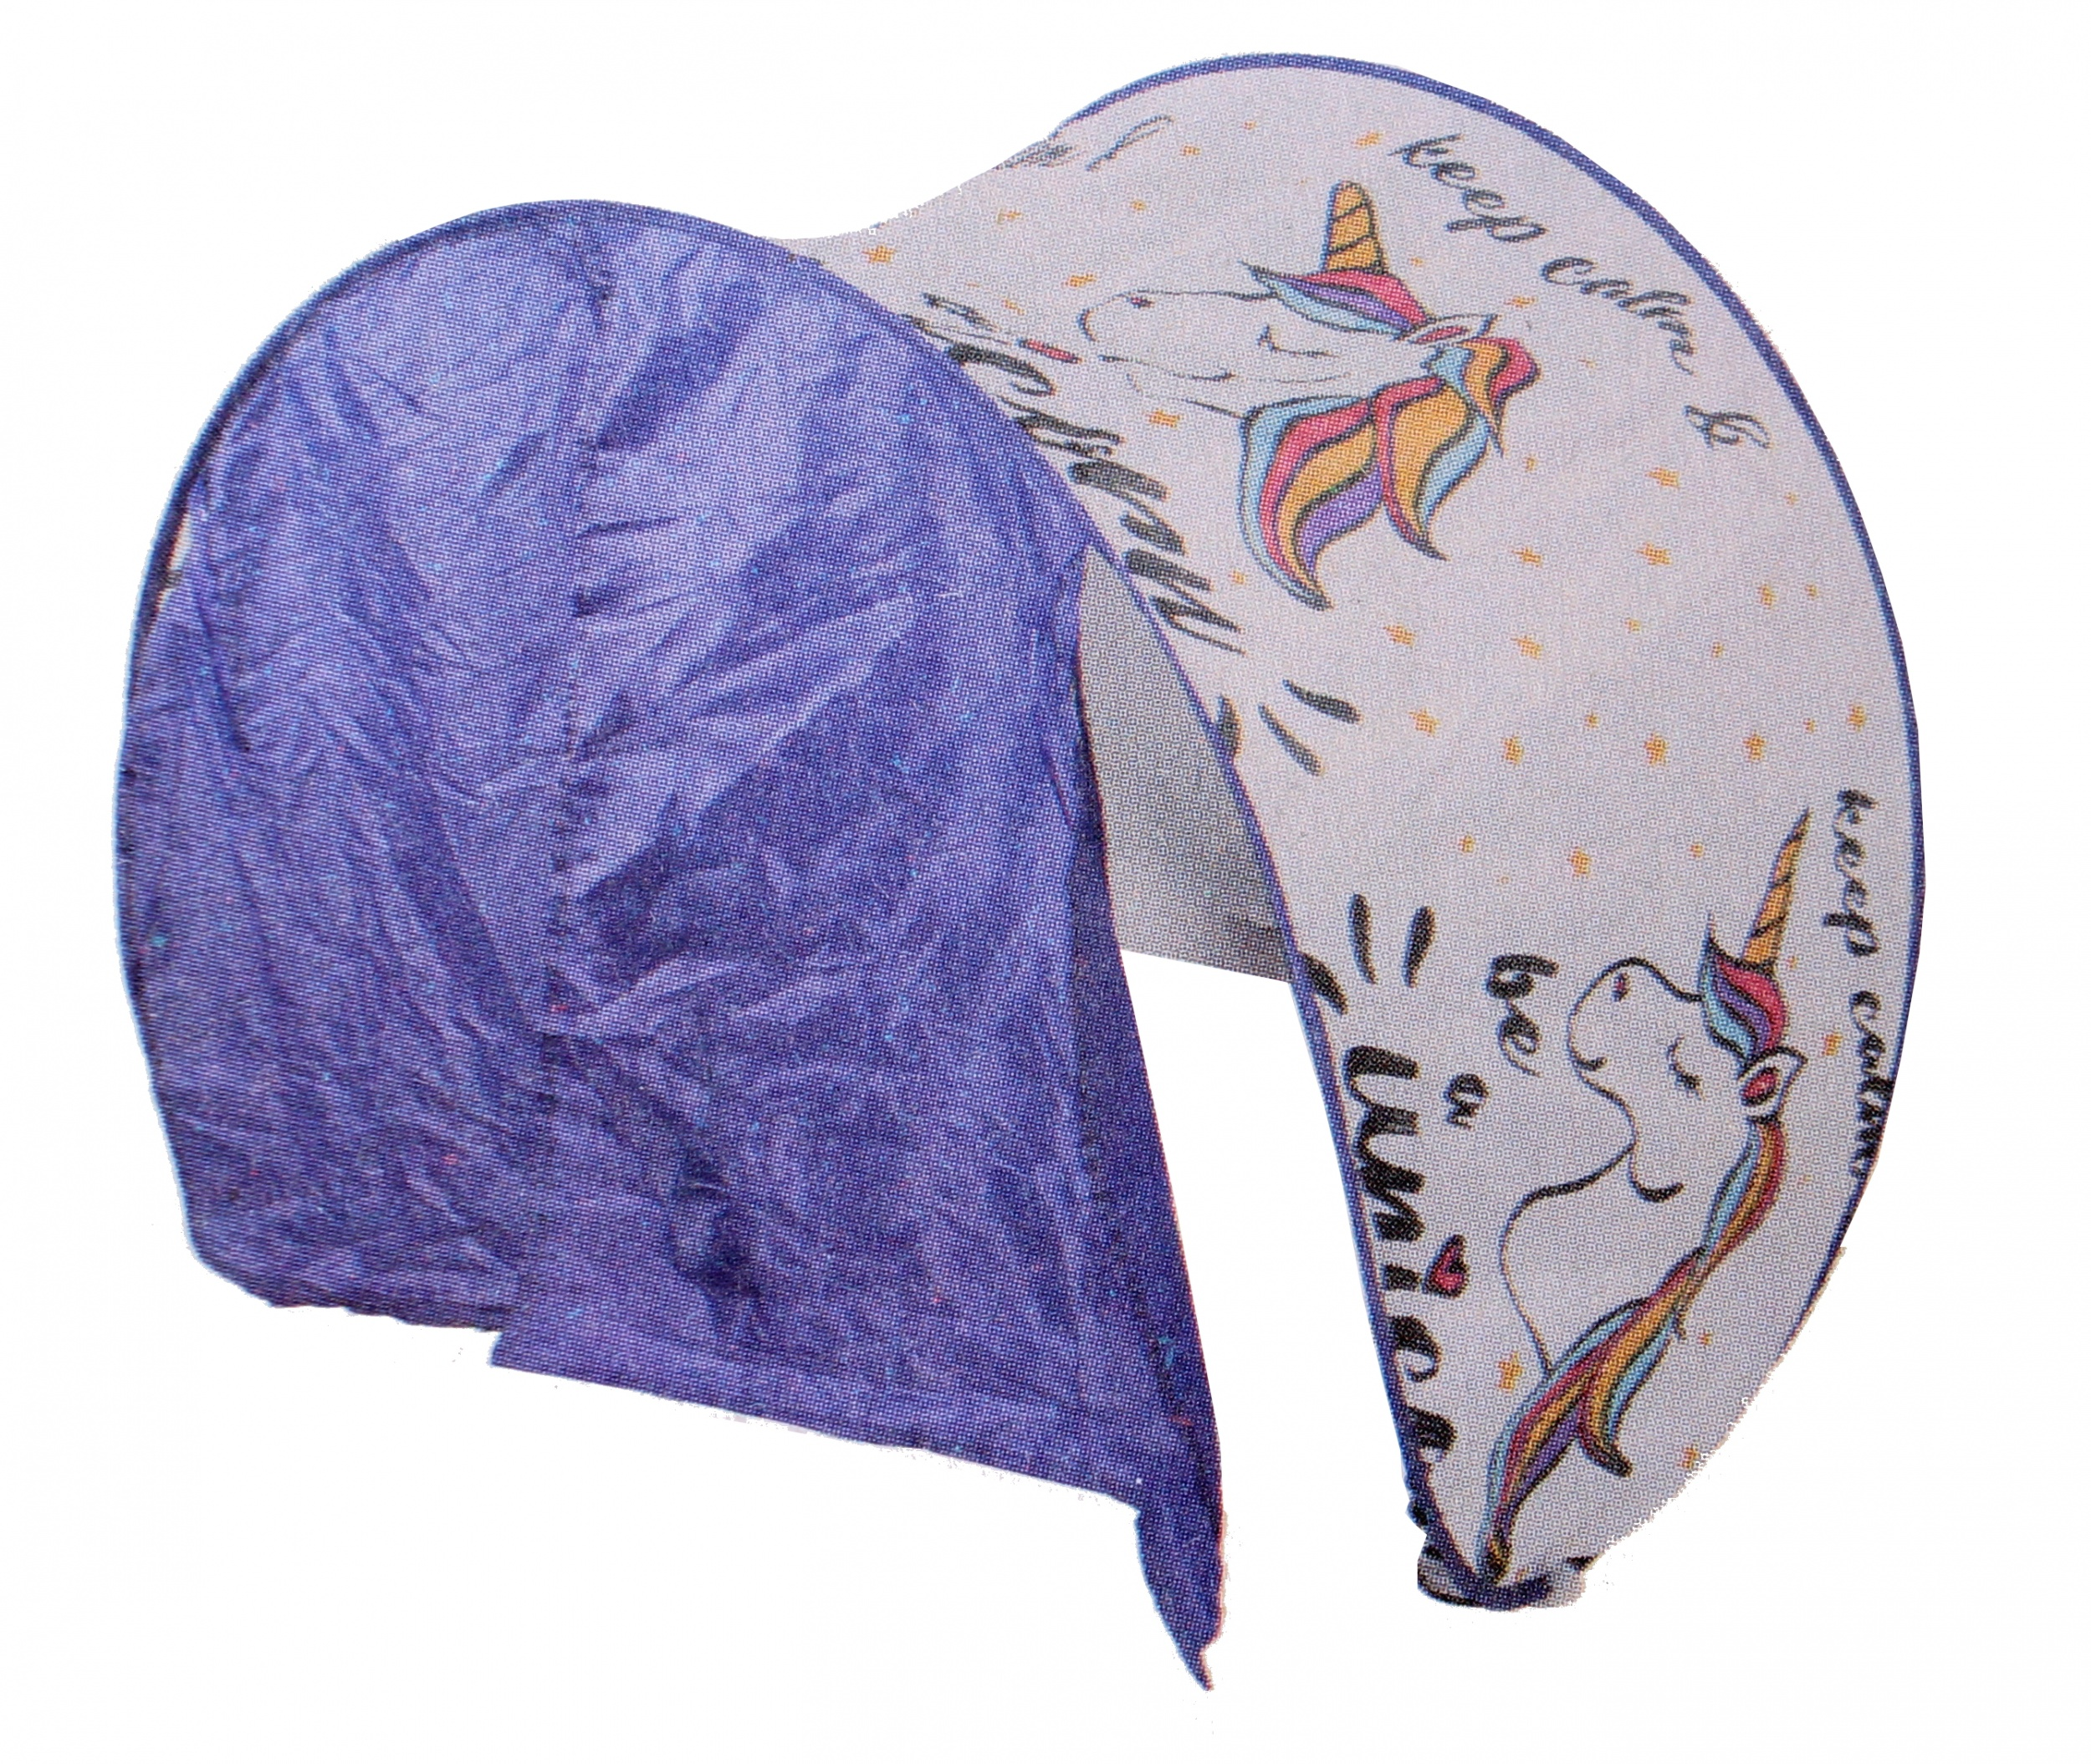 buy popular 57032 c74b5 Eddy Toys unicorn dream tent for bed - Internet-Toys